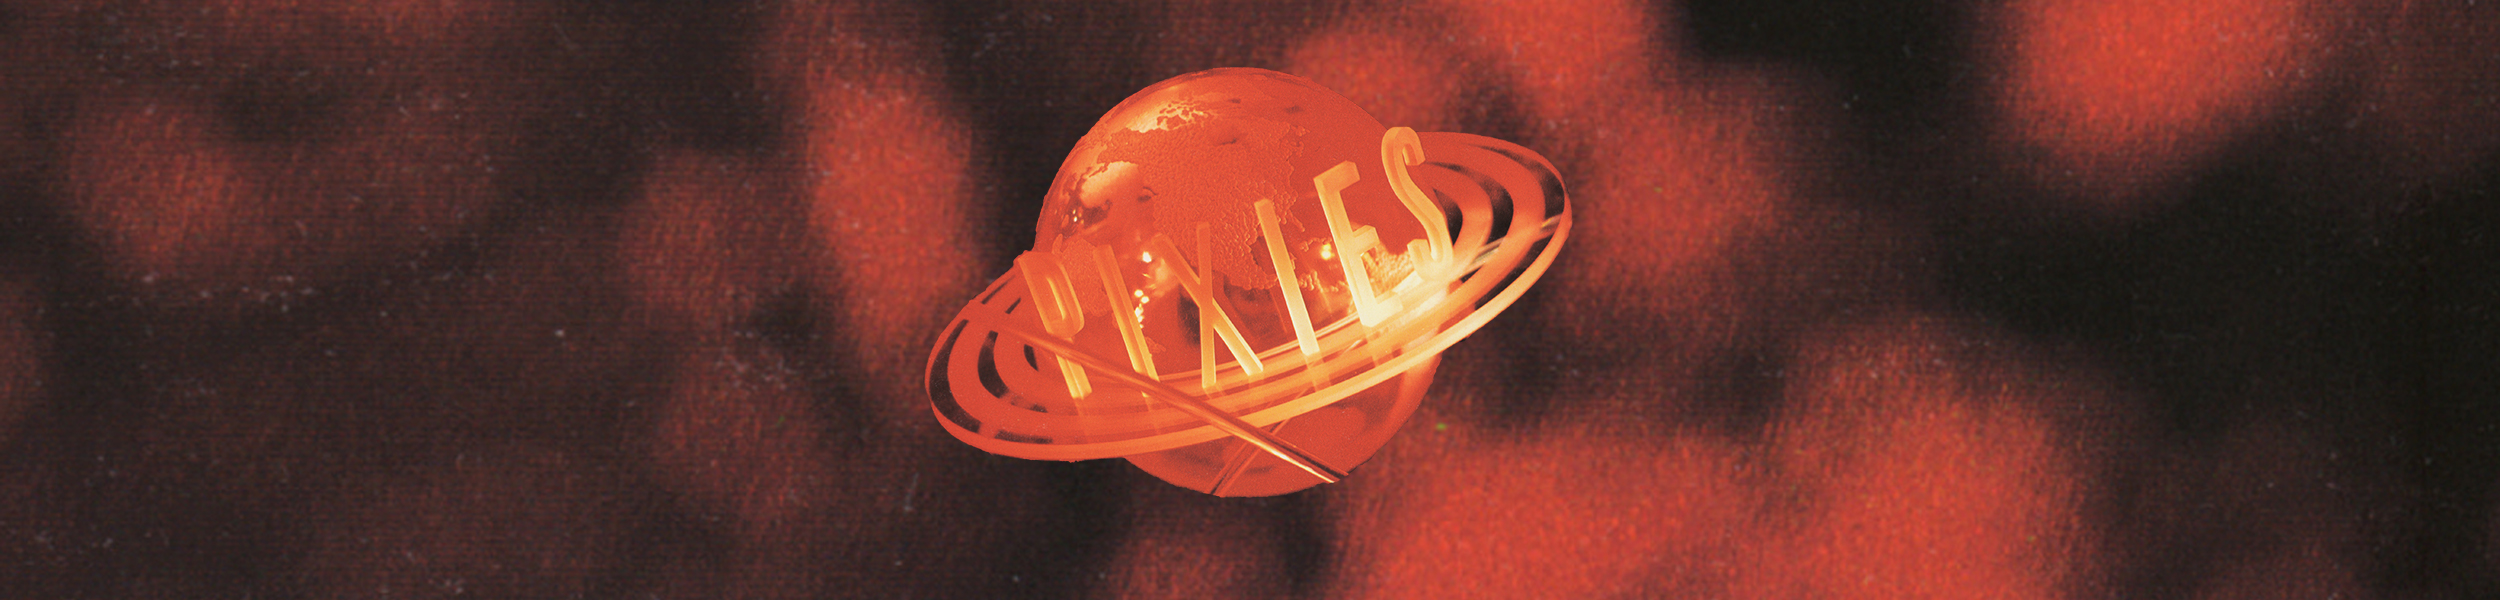 Pixies - Bossanova - 30th Anniversary Vinyl Reissue